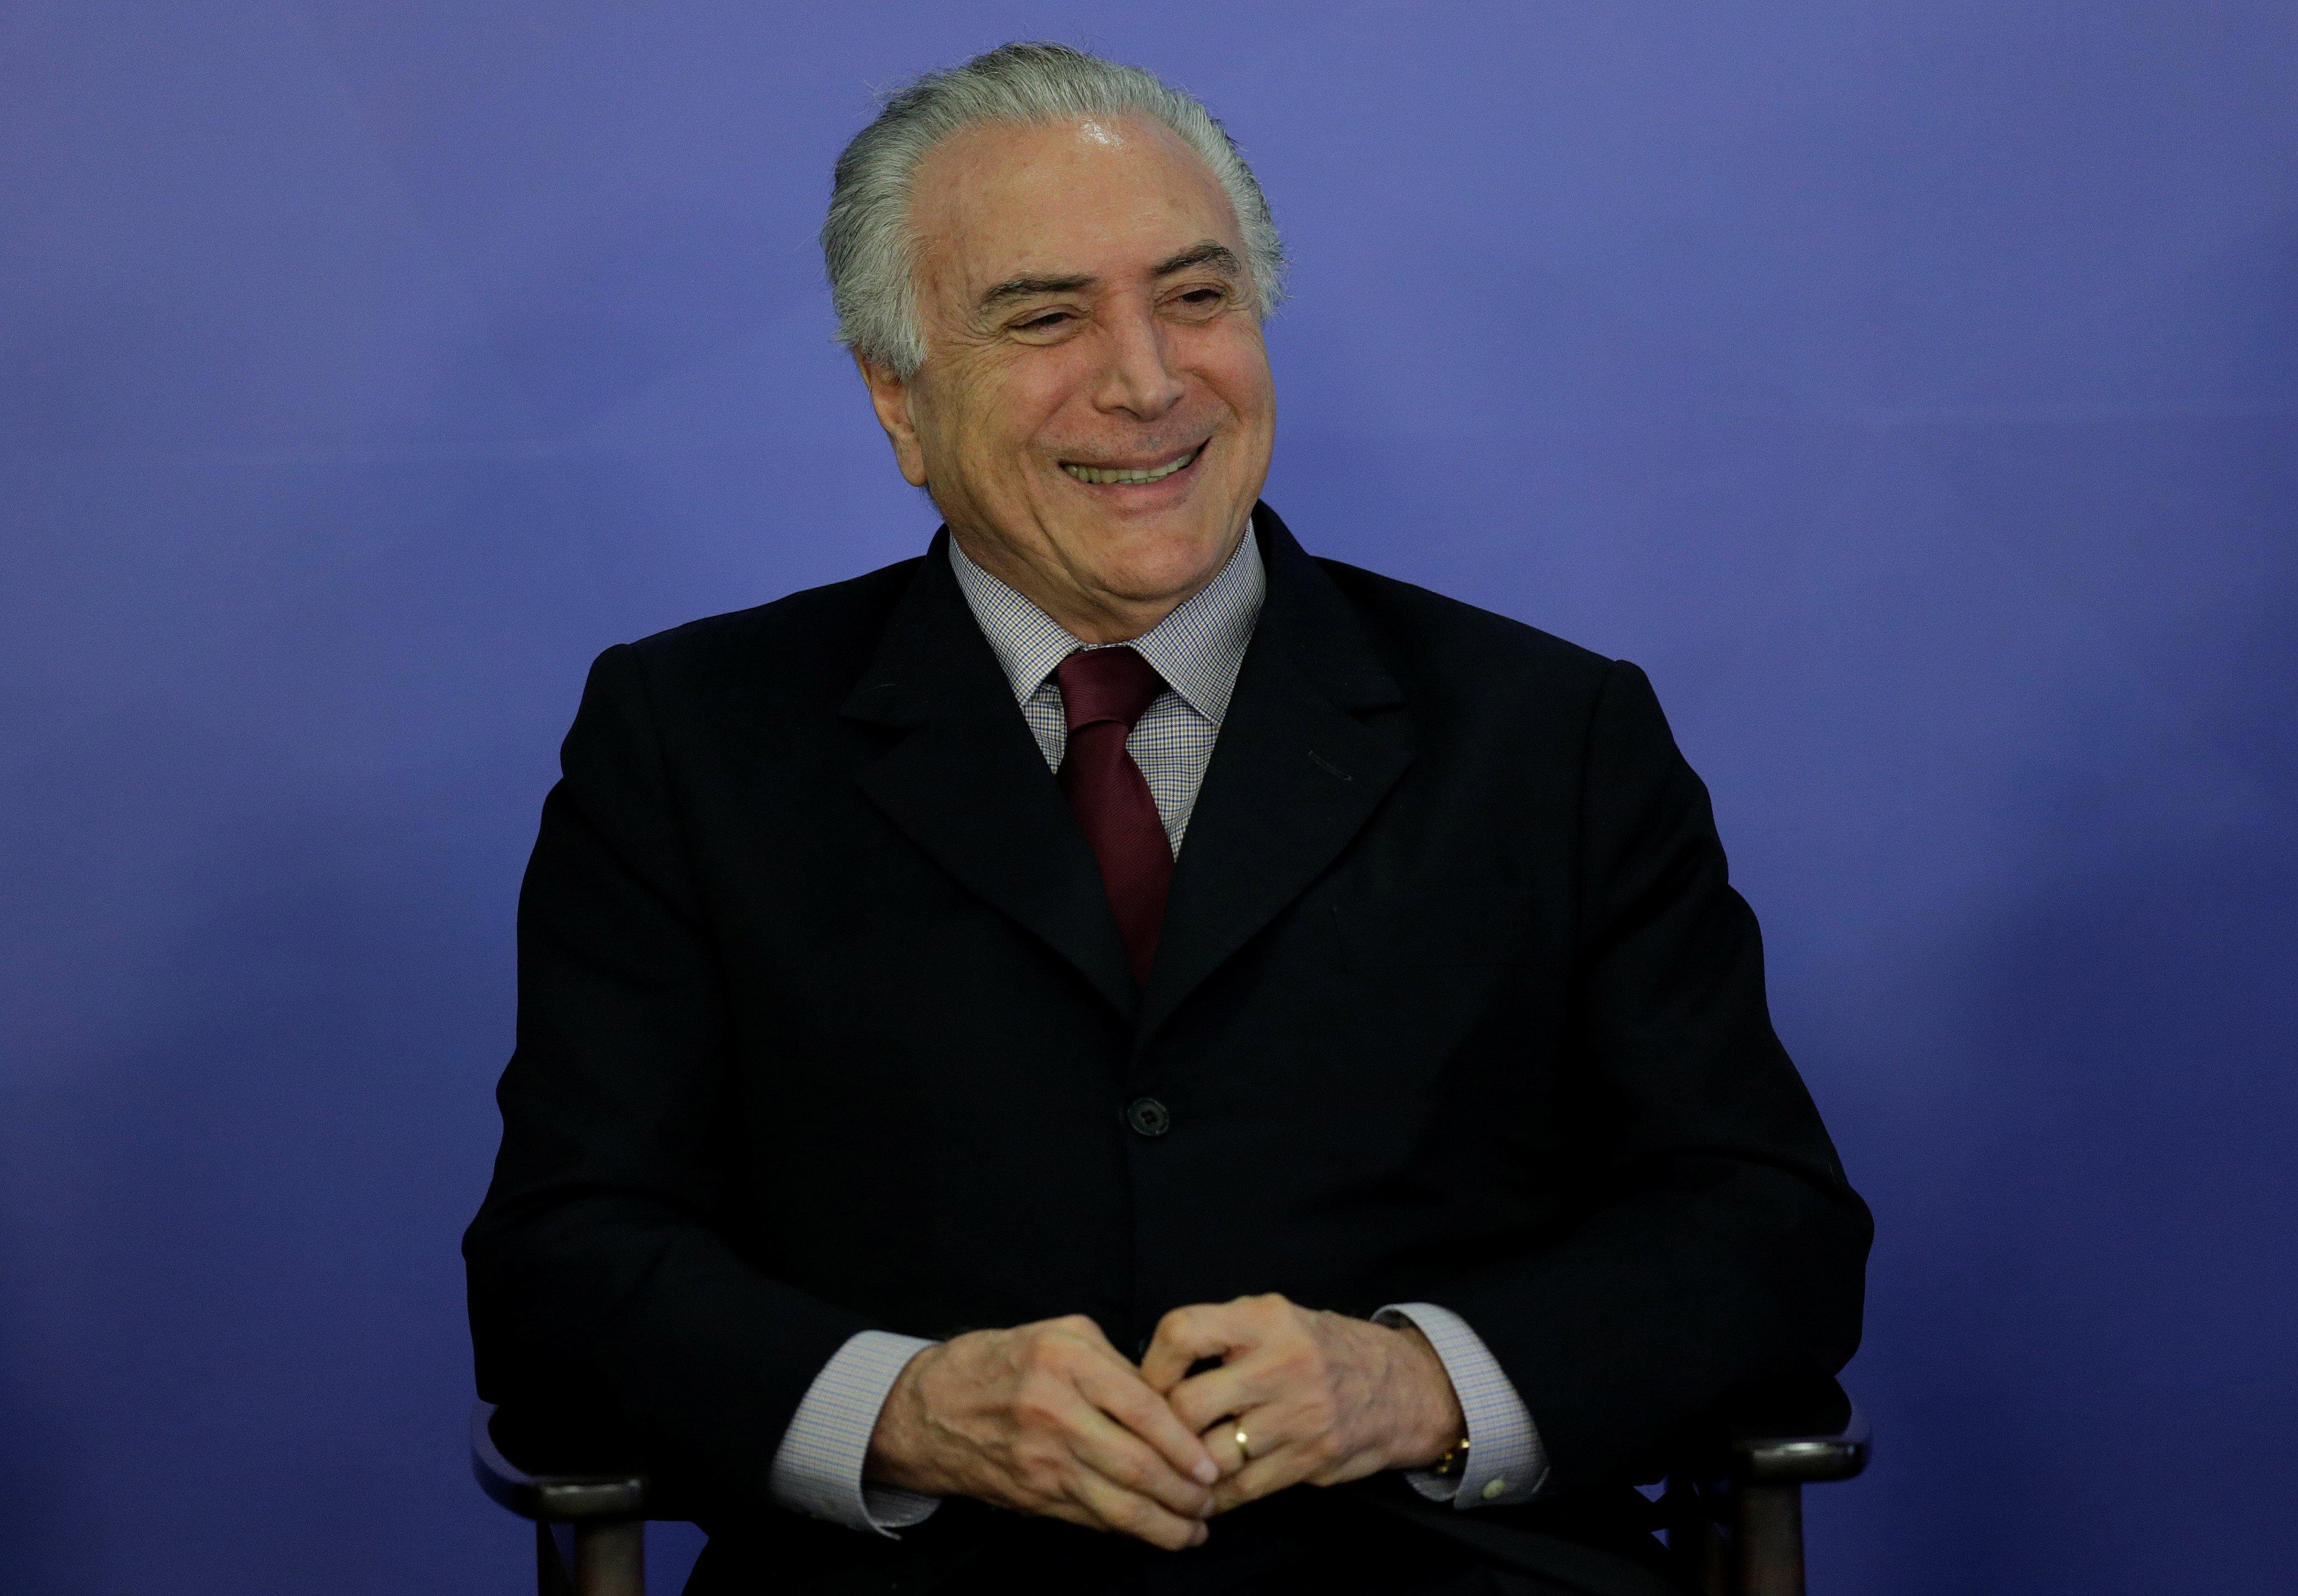 Justiça manda soltar o ex-presidente Michel